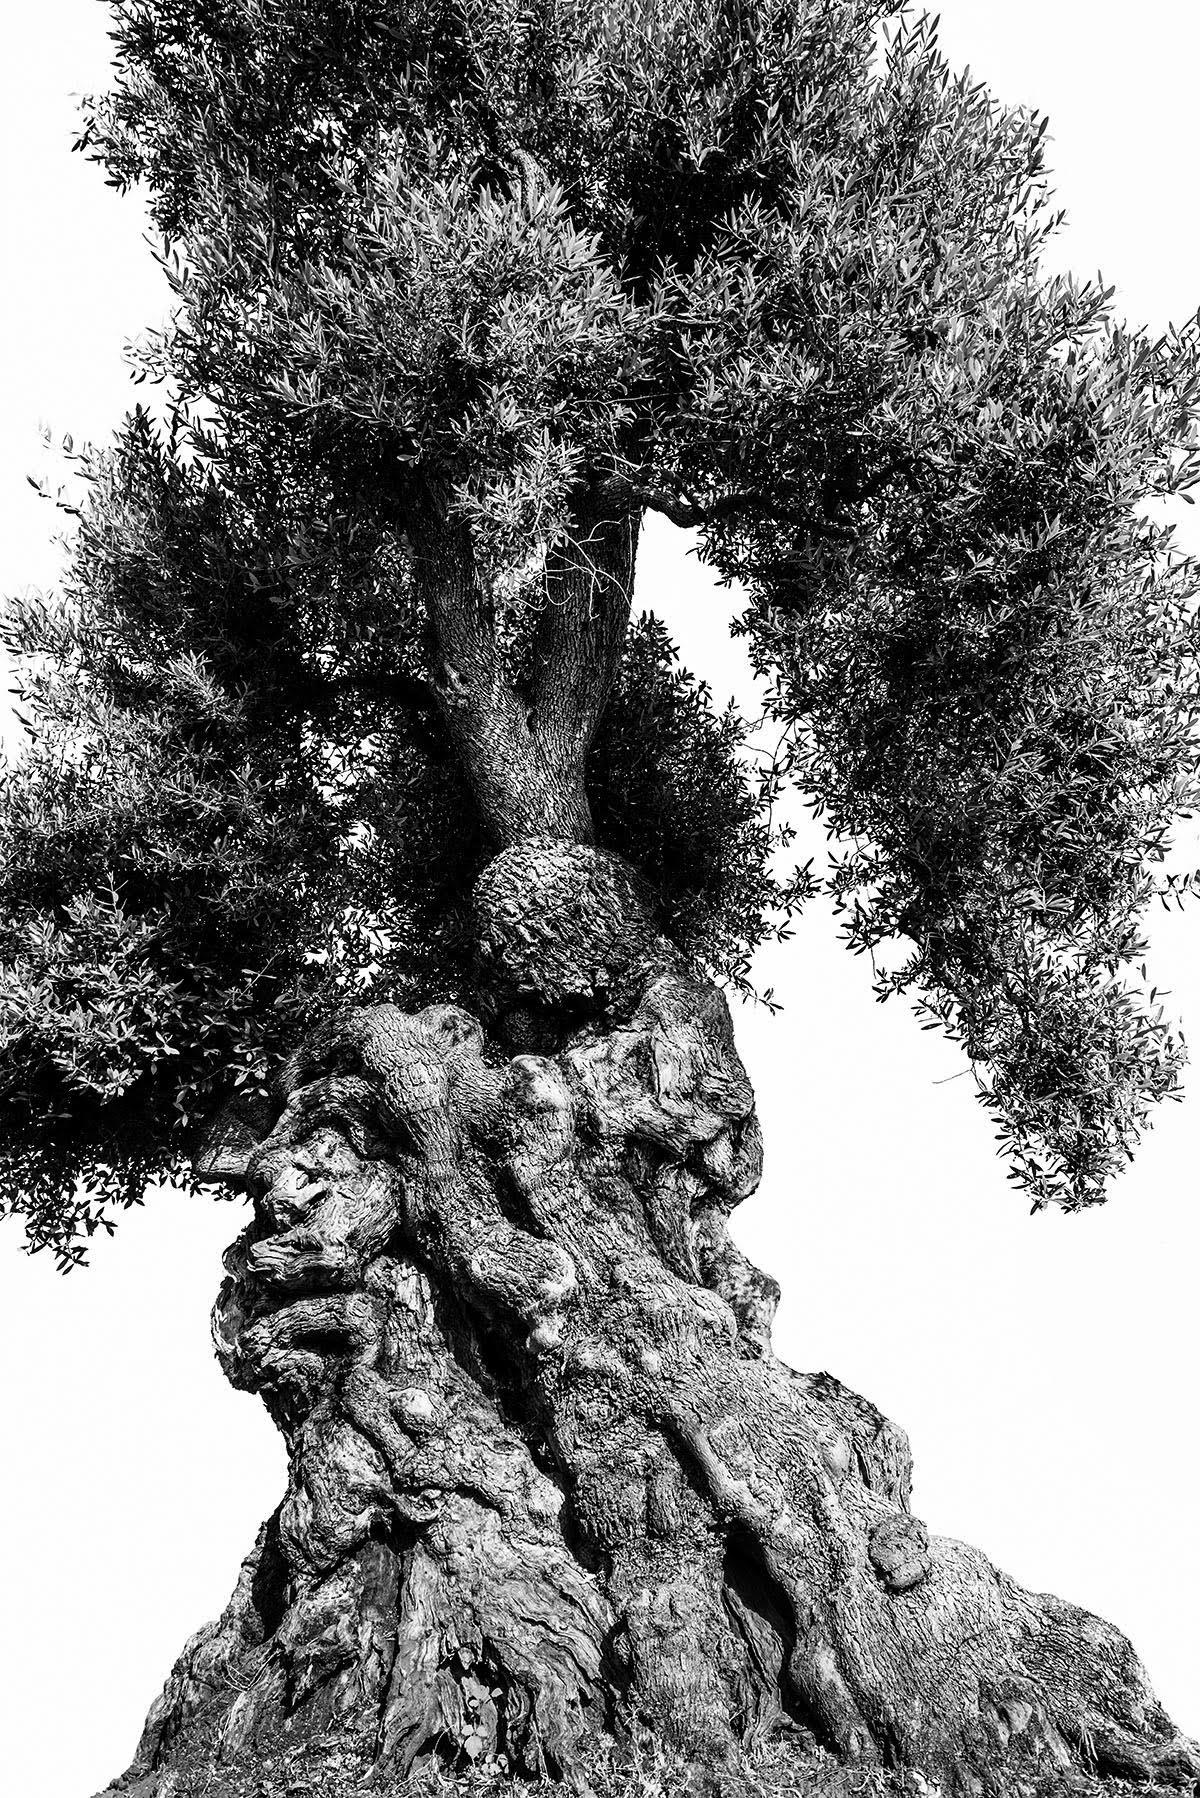 martin-ogolter-Monumentali-nature-landscape-photographer-09